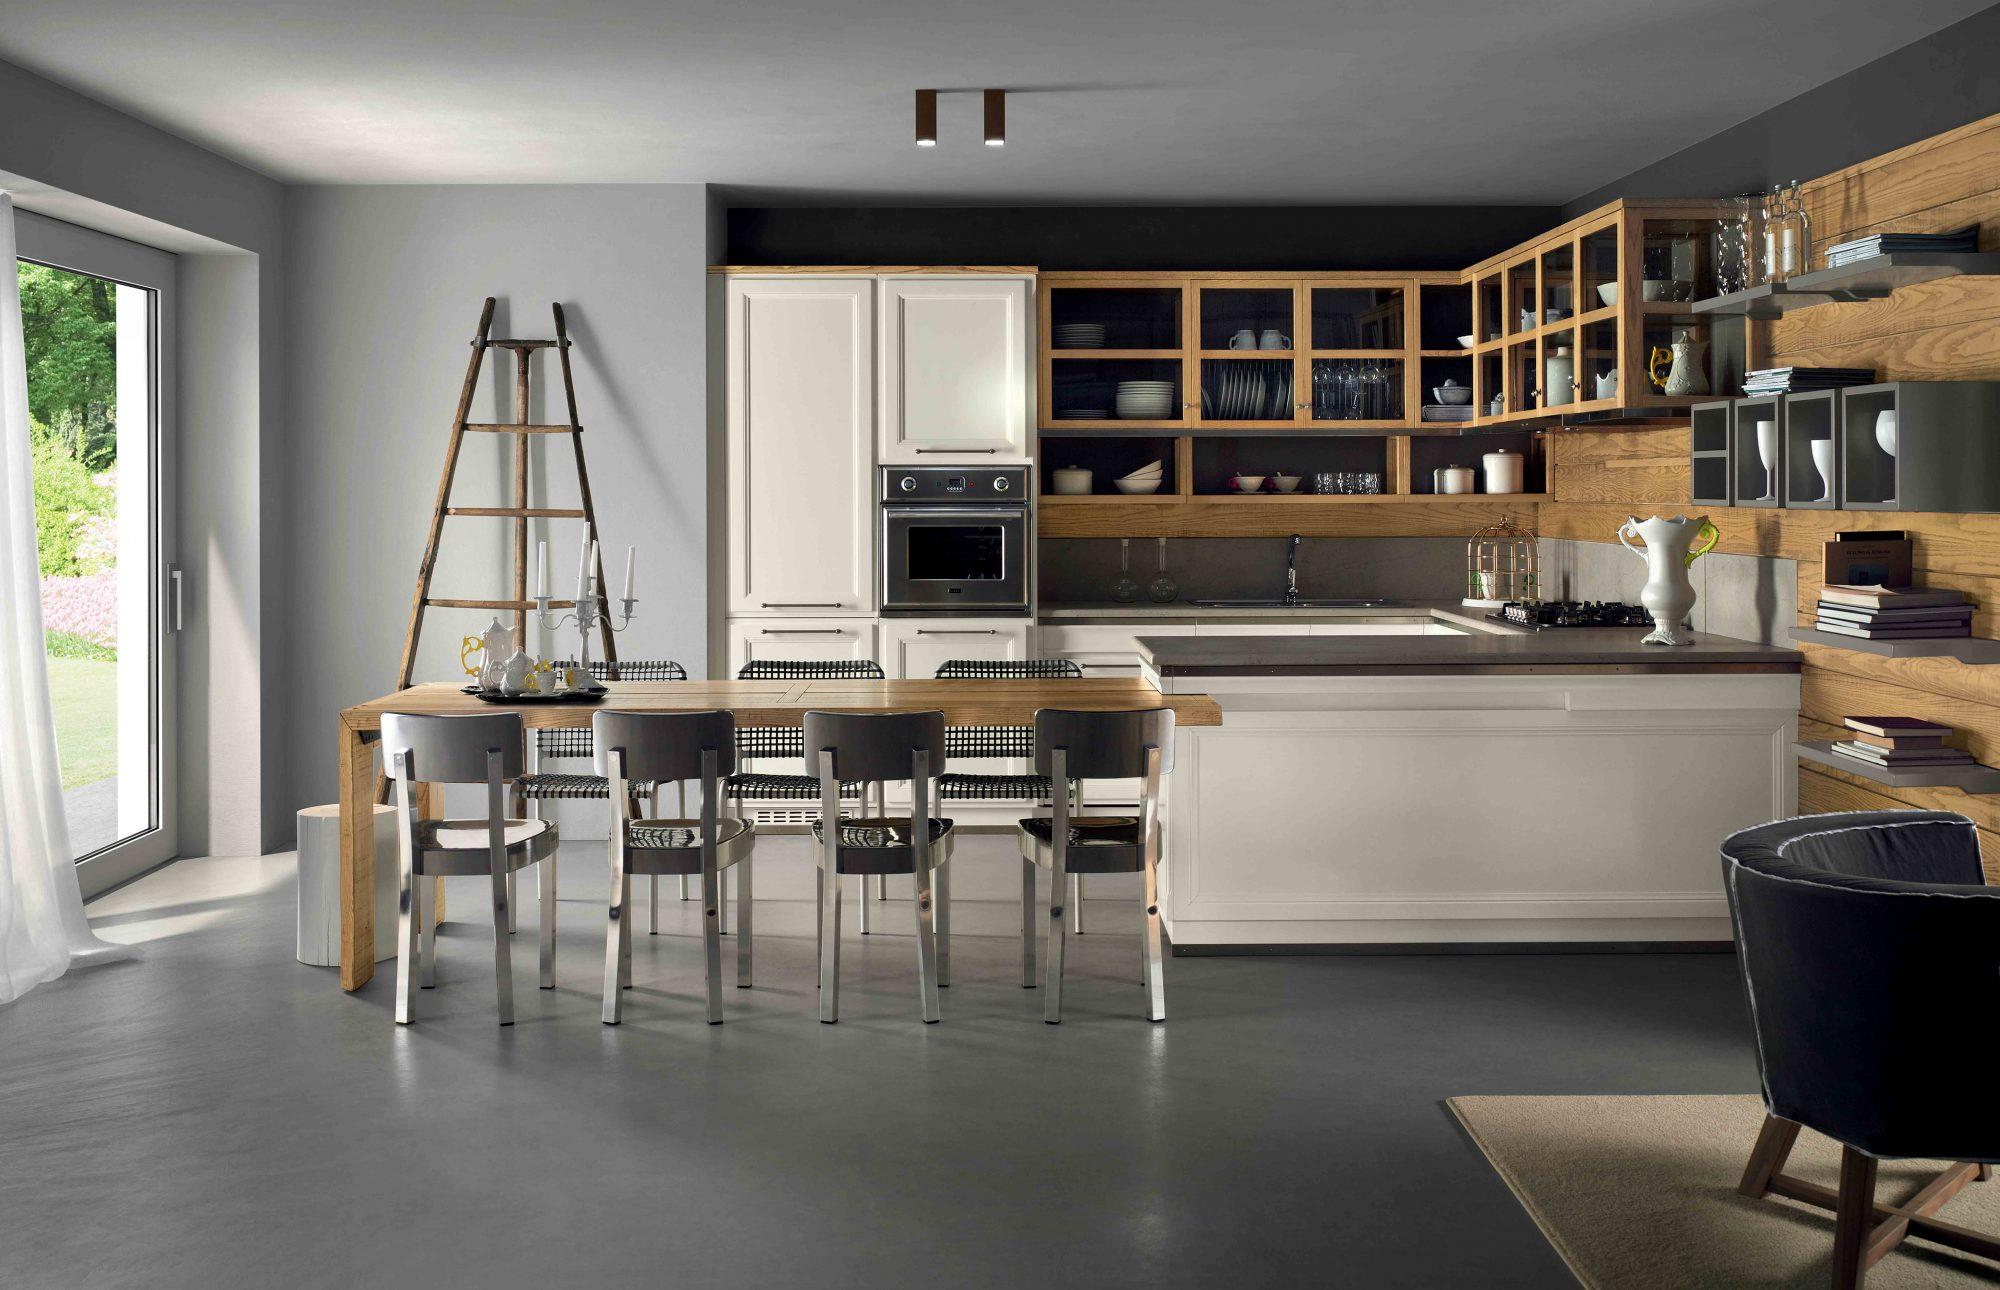 Cucina Living Design - La cucina classica intramontabile | L ...